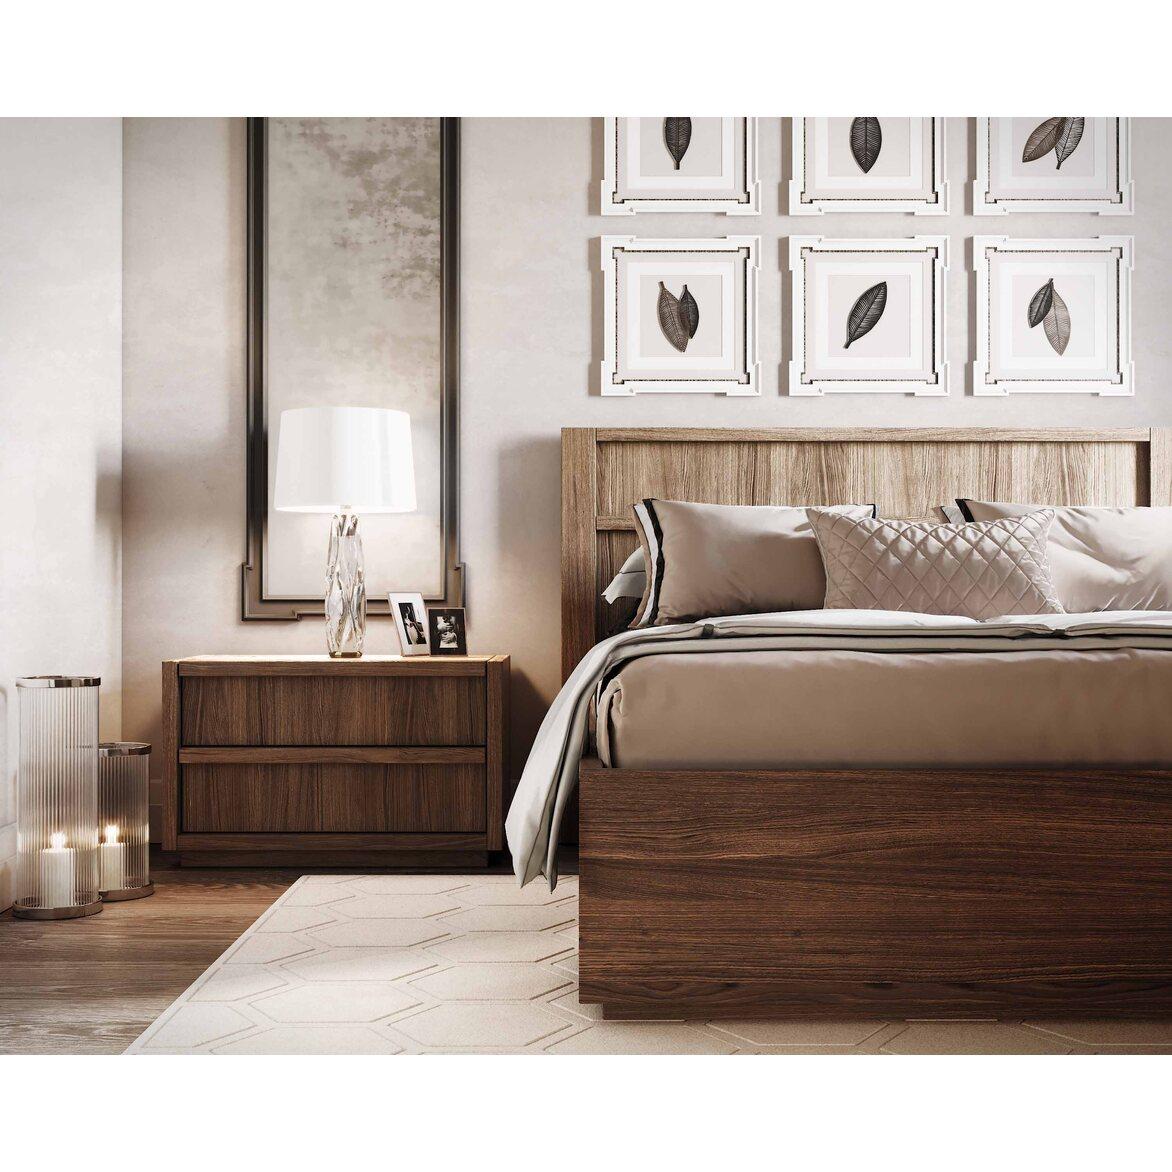 "Кровать 160*200 ""Brenson"" 7 | Двуспальные кровати Kingsby"